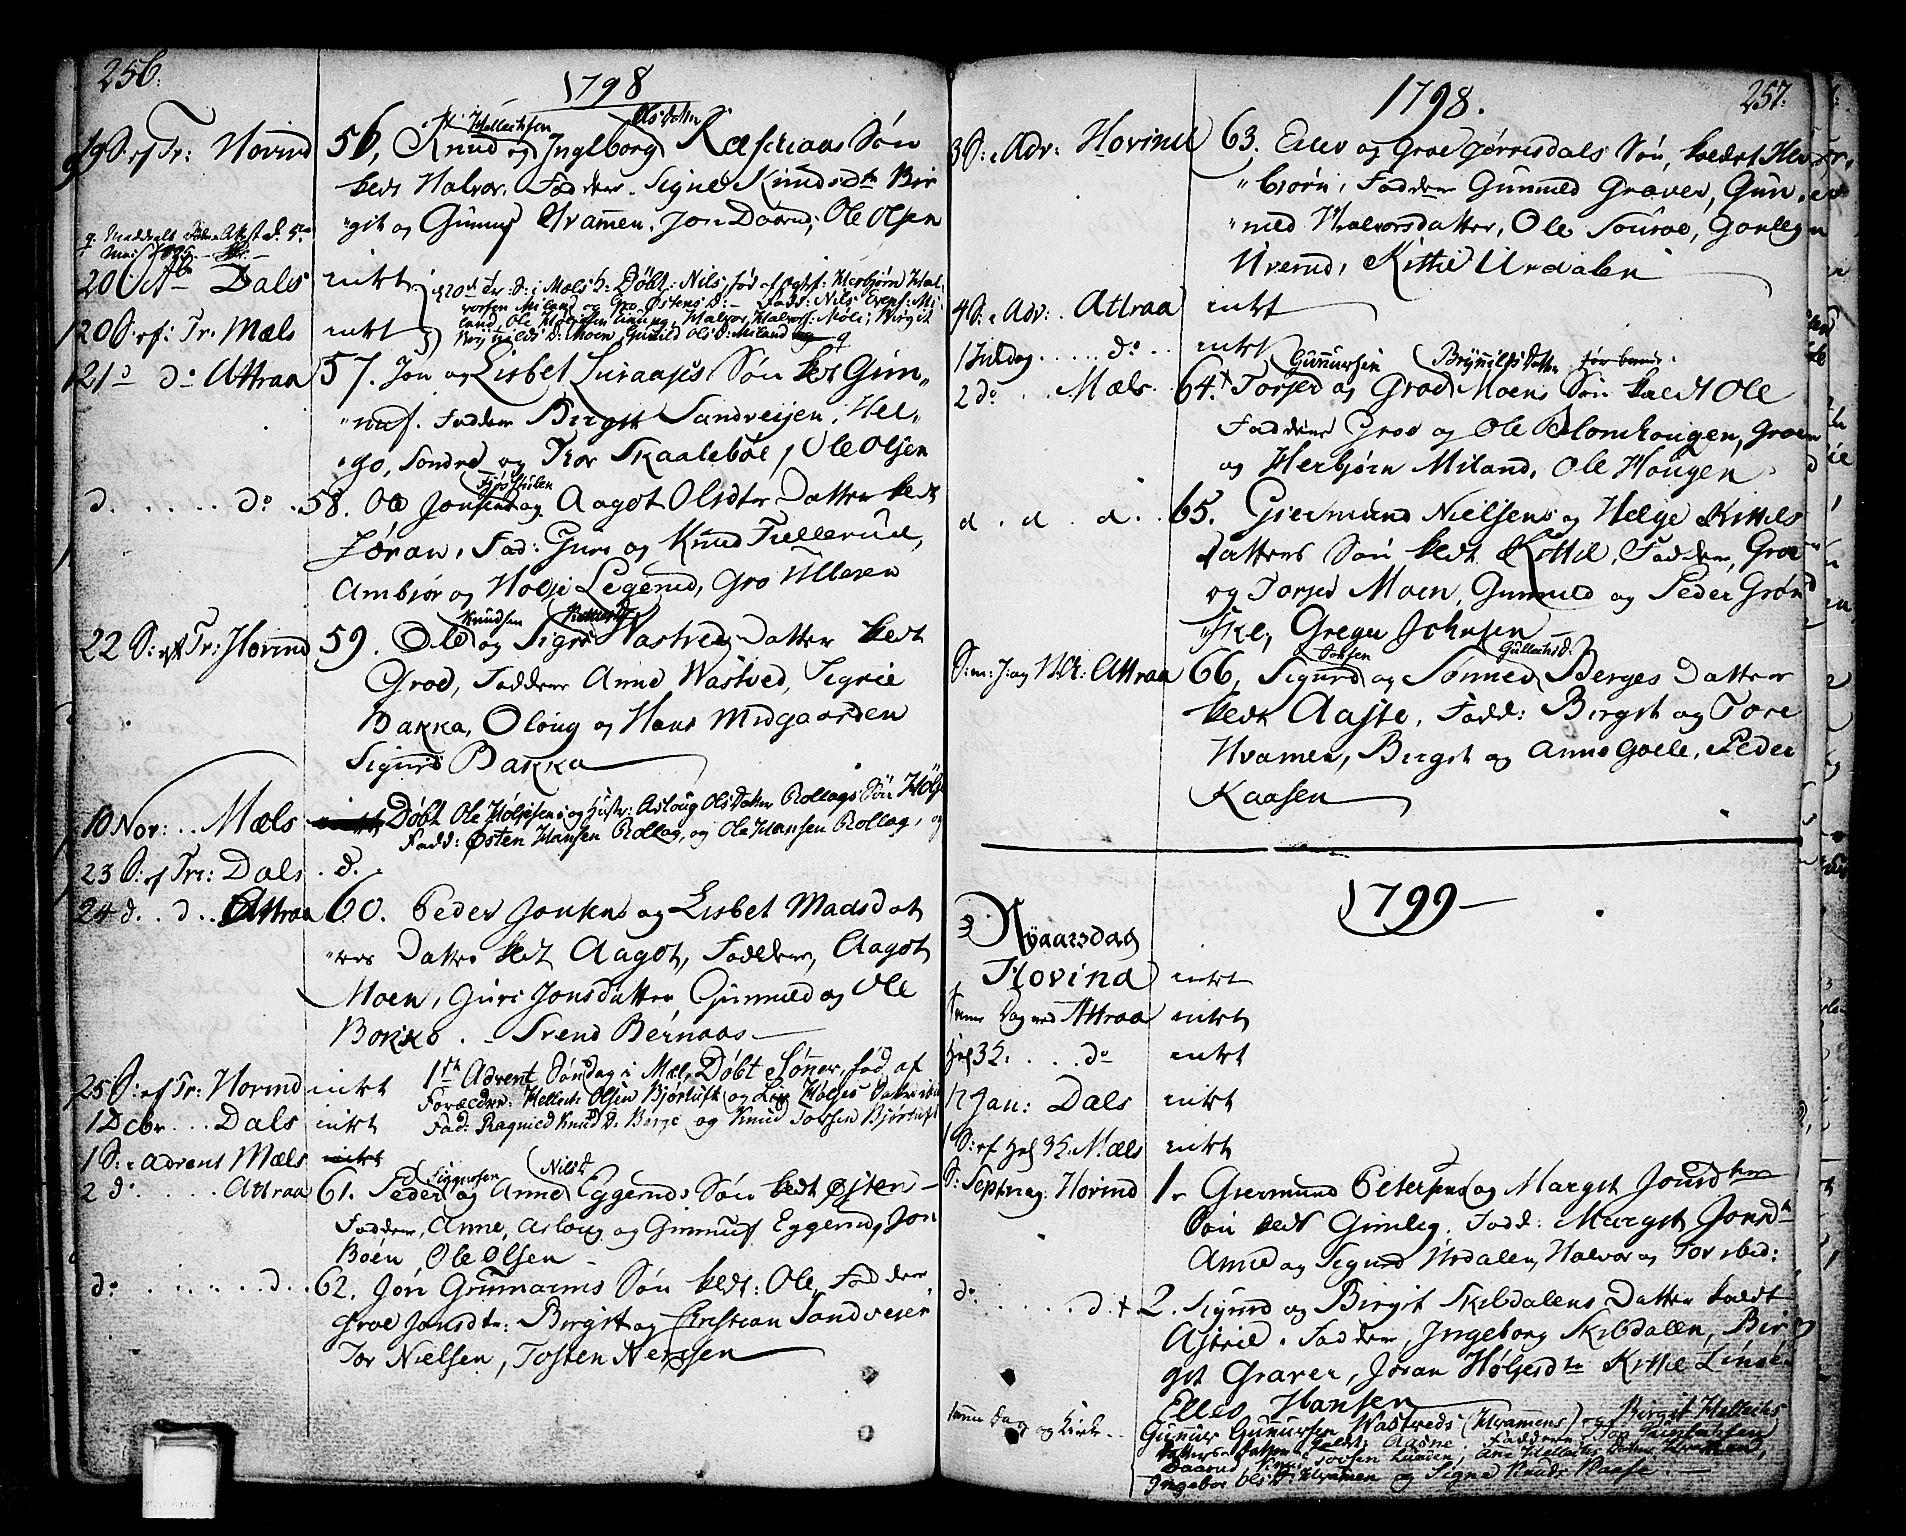 SAKO, Tinn kirkebøker, F/Fa/L0002: Ministerialbok nr. I 2, 1757-1810, s. 256-257